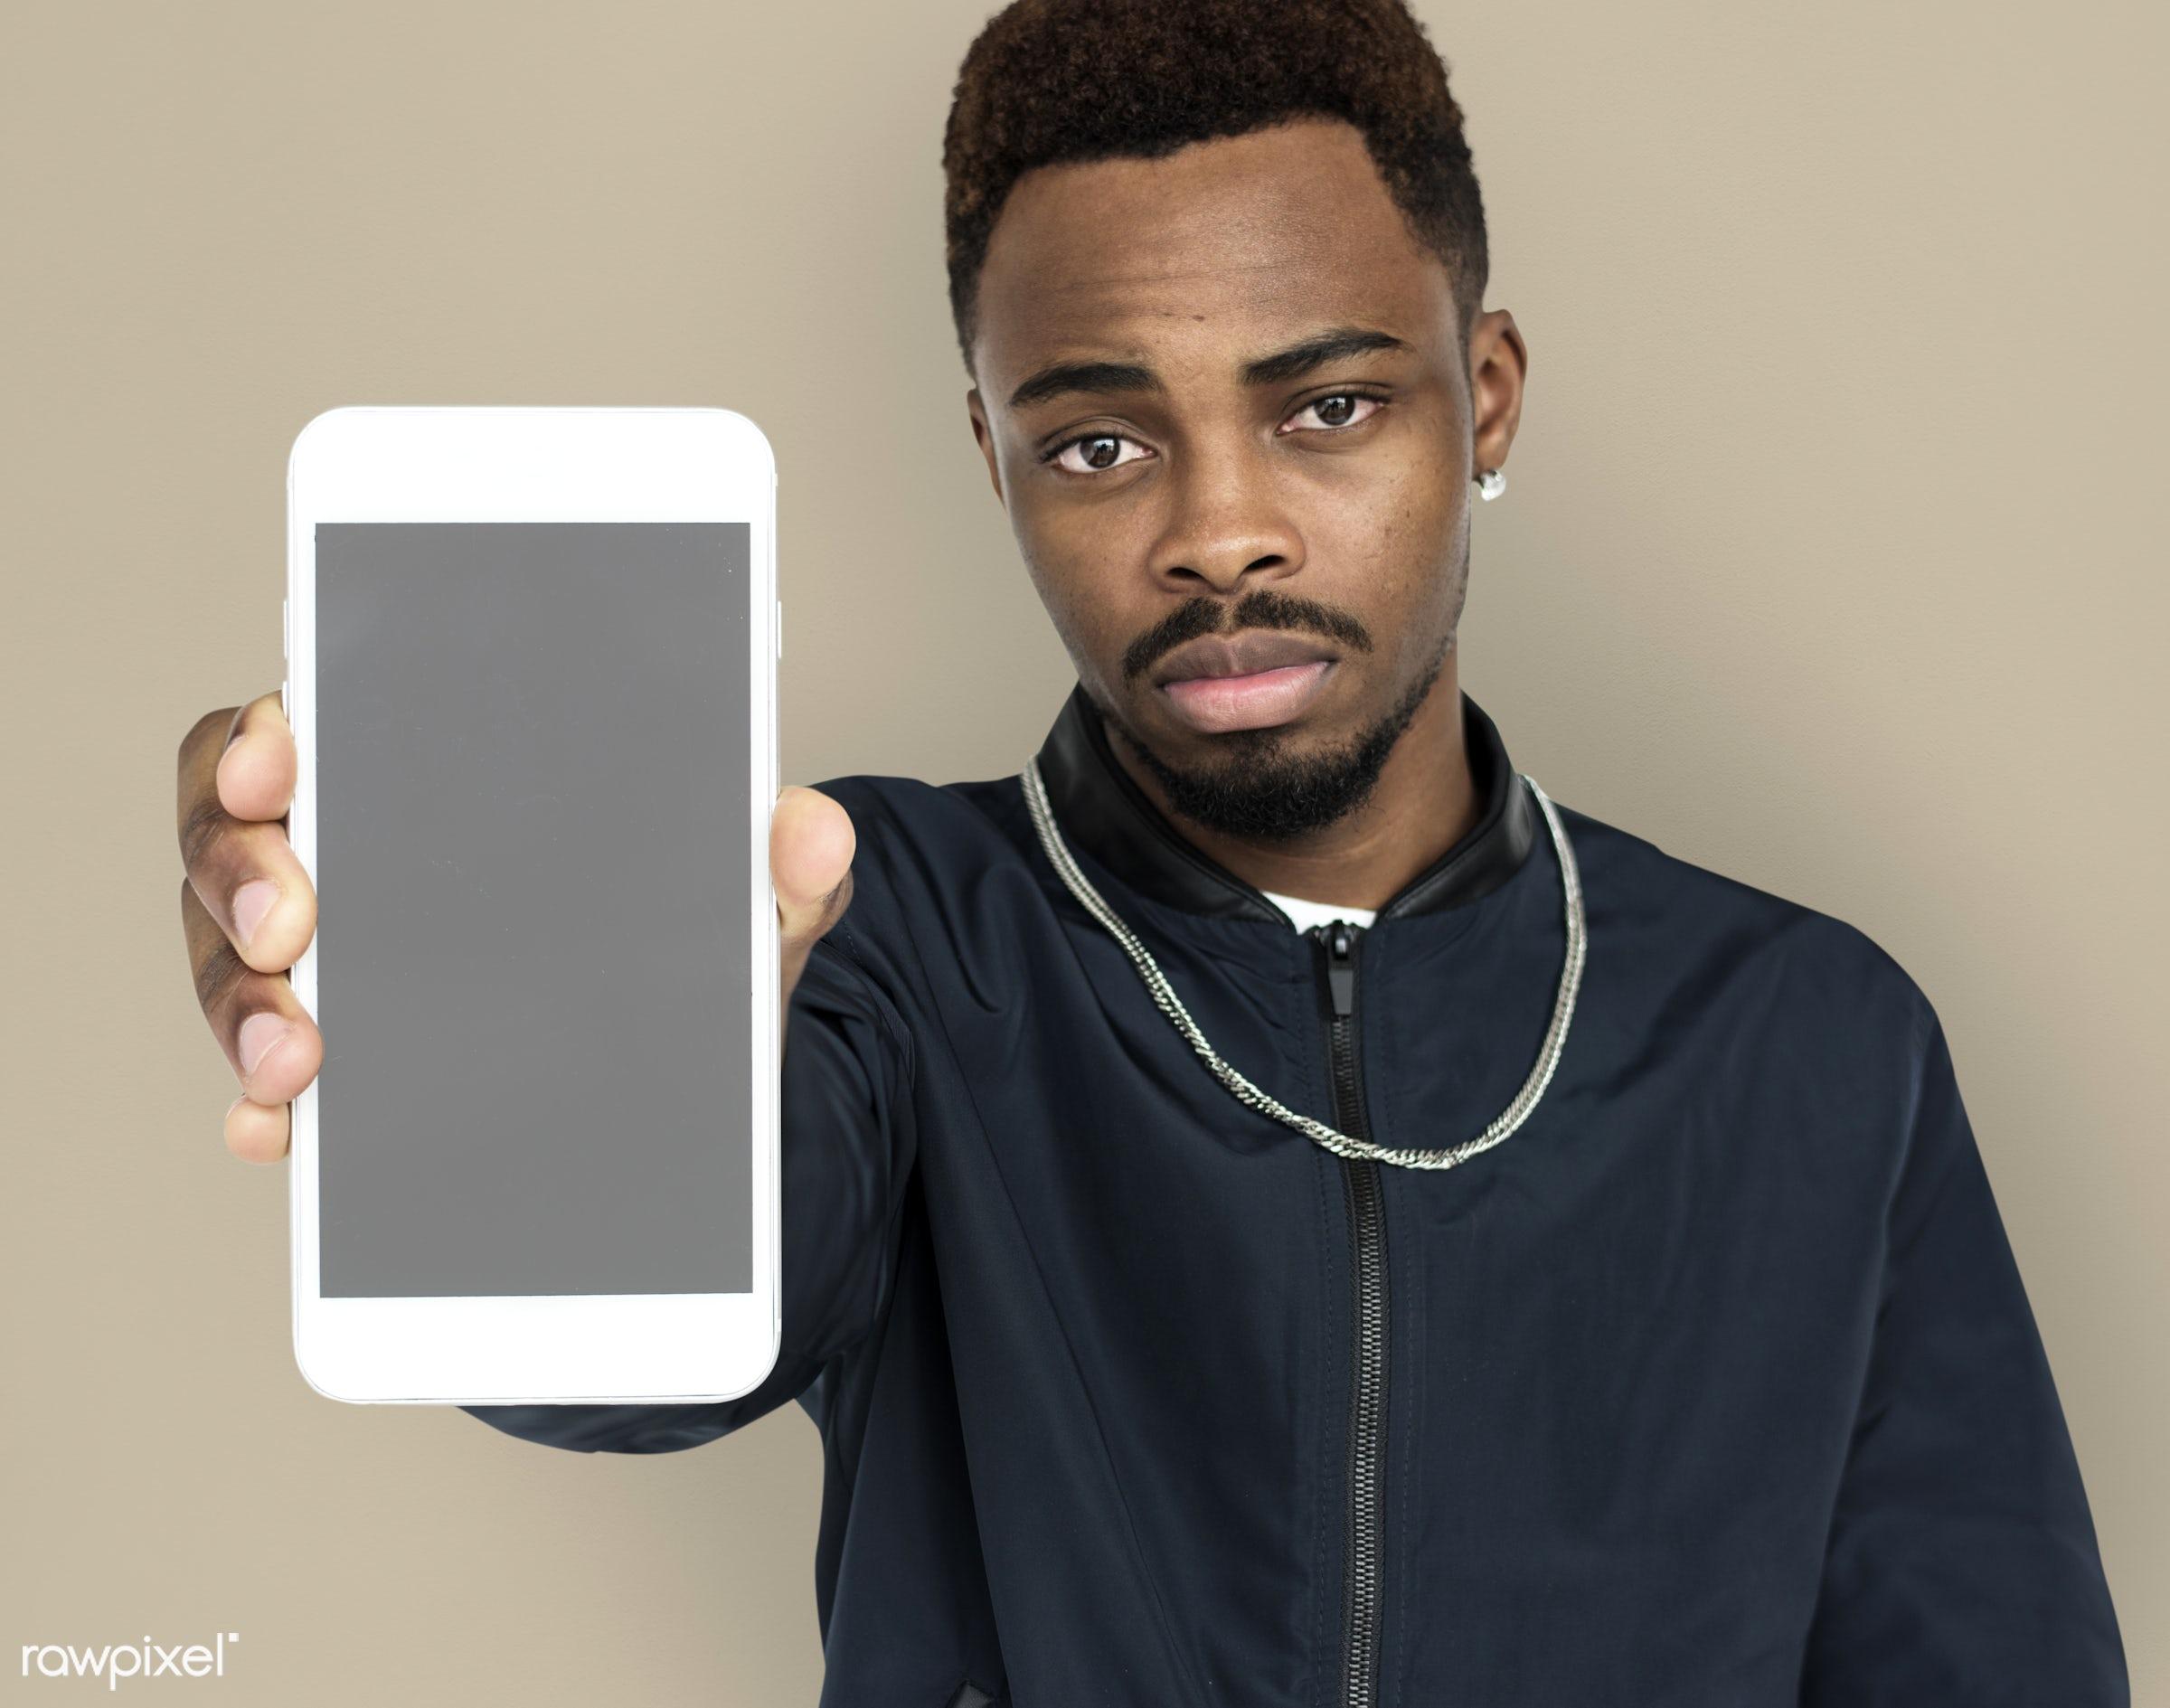 african descent, background, beard, black, brown, communication, device, emotion, expression, focused, holding, holding...